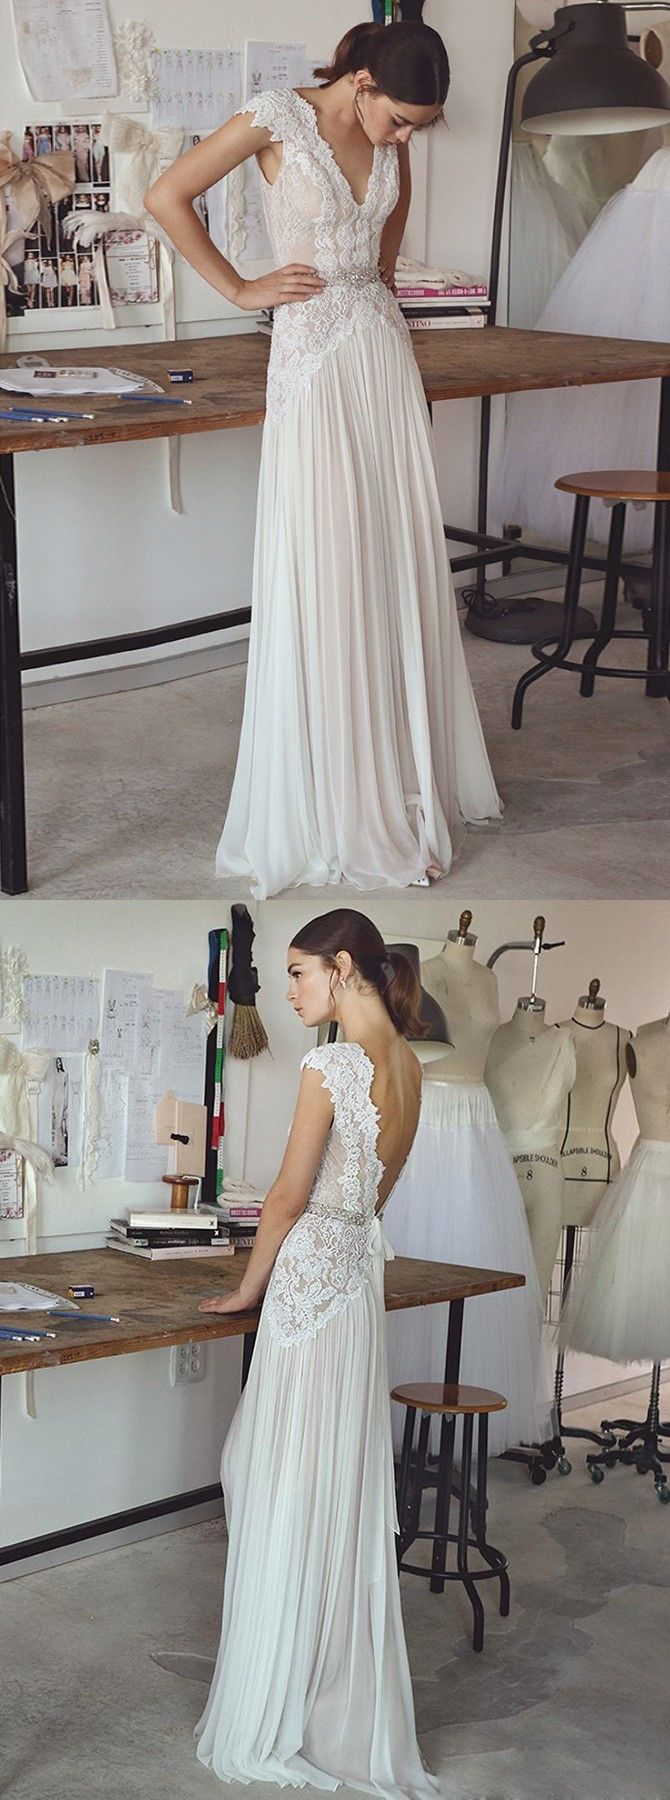 Long sleeve chiffon wedding dress  ALine VNeck Cap Sleeves Chiffon Wedding Dress with Lace Beading